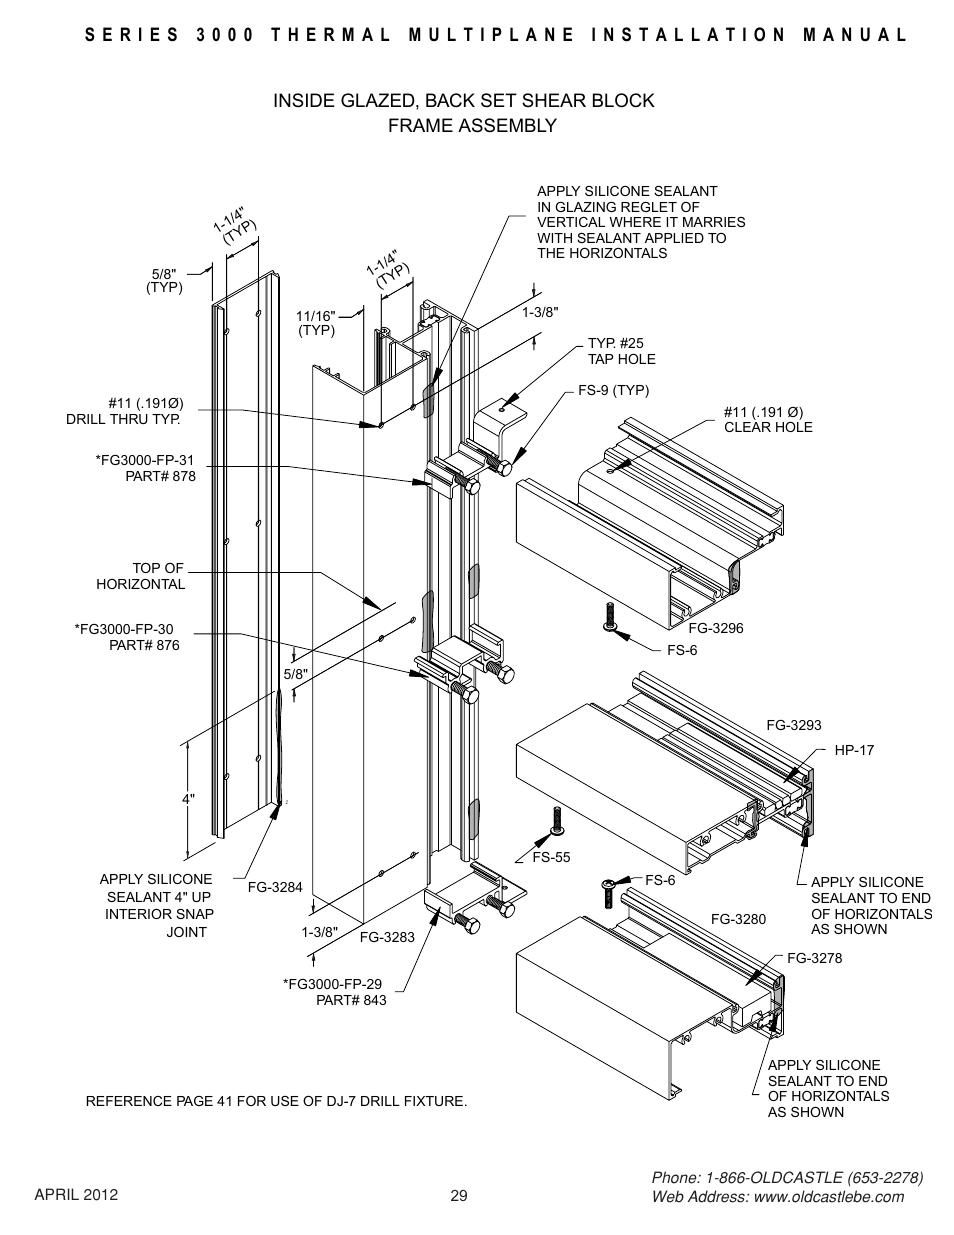 Backset-isg-frm-assy, Inside glazed, back set shear block